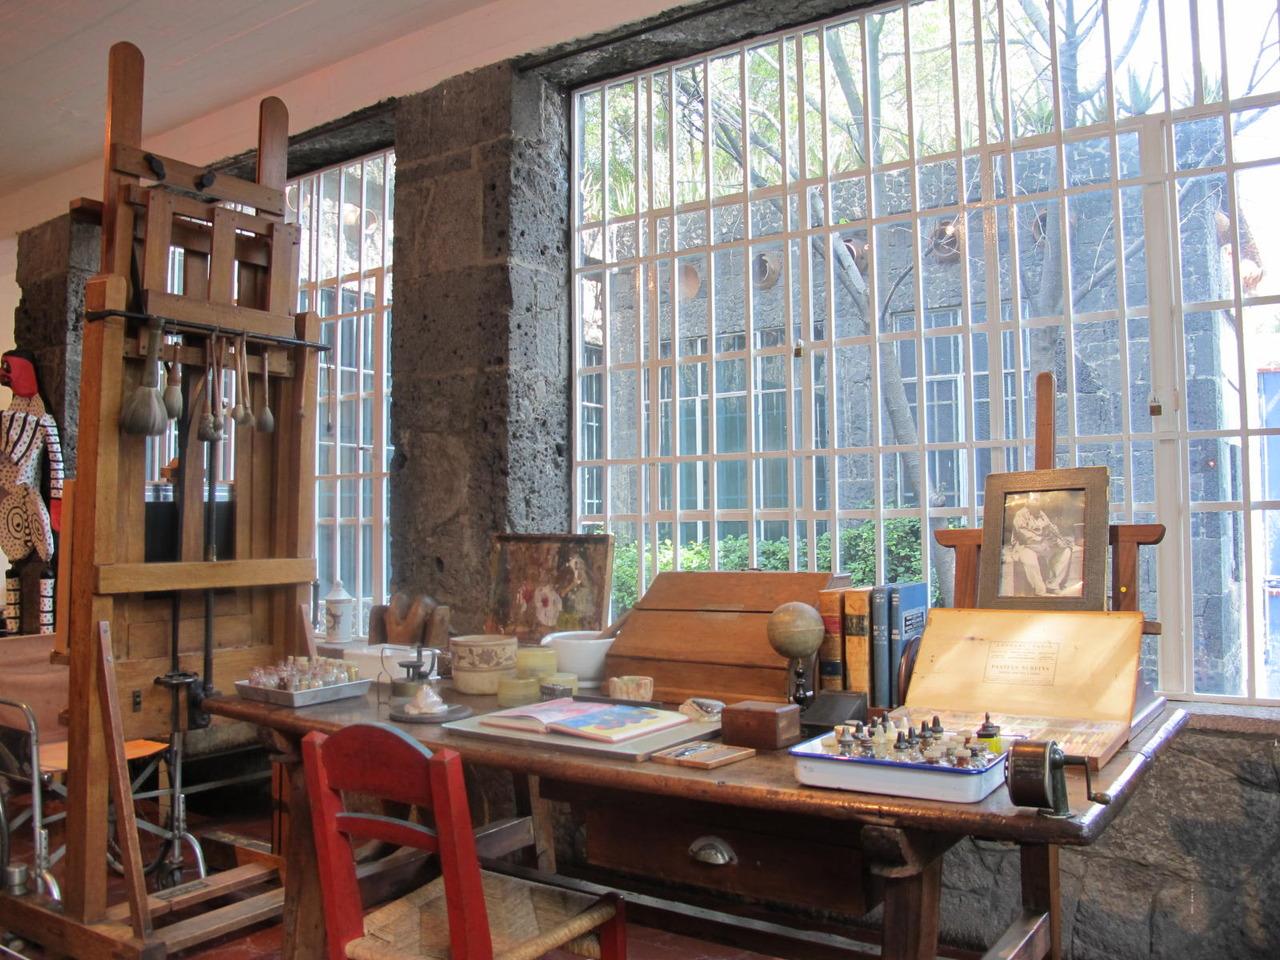 Frida & Diego studio